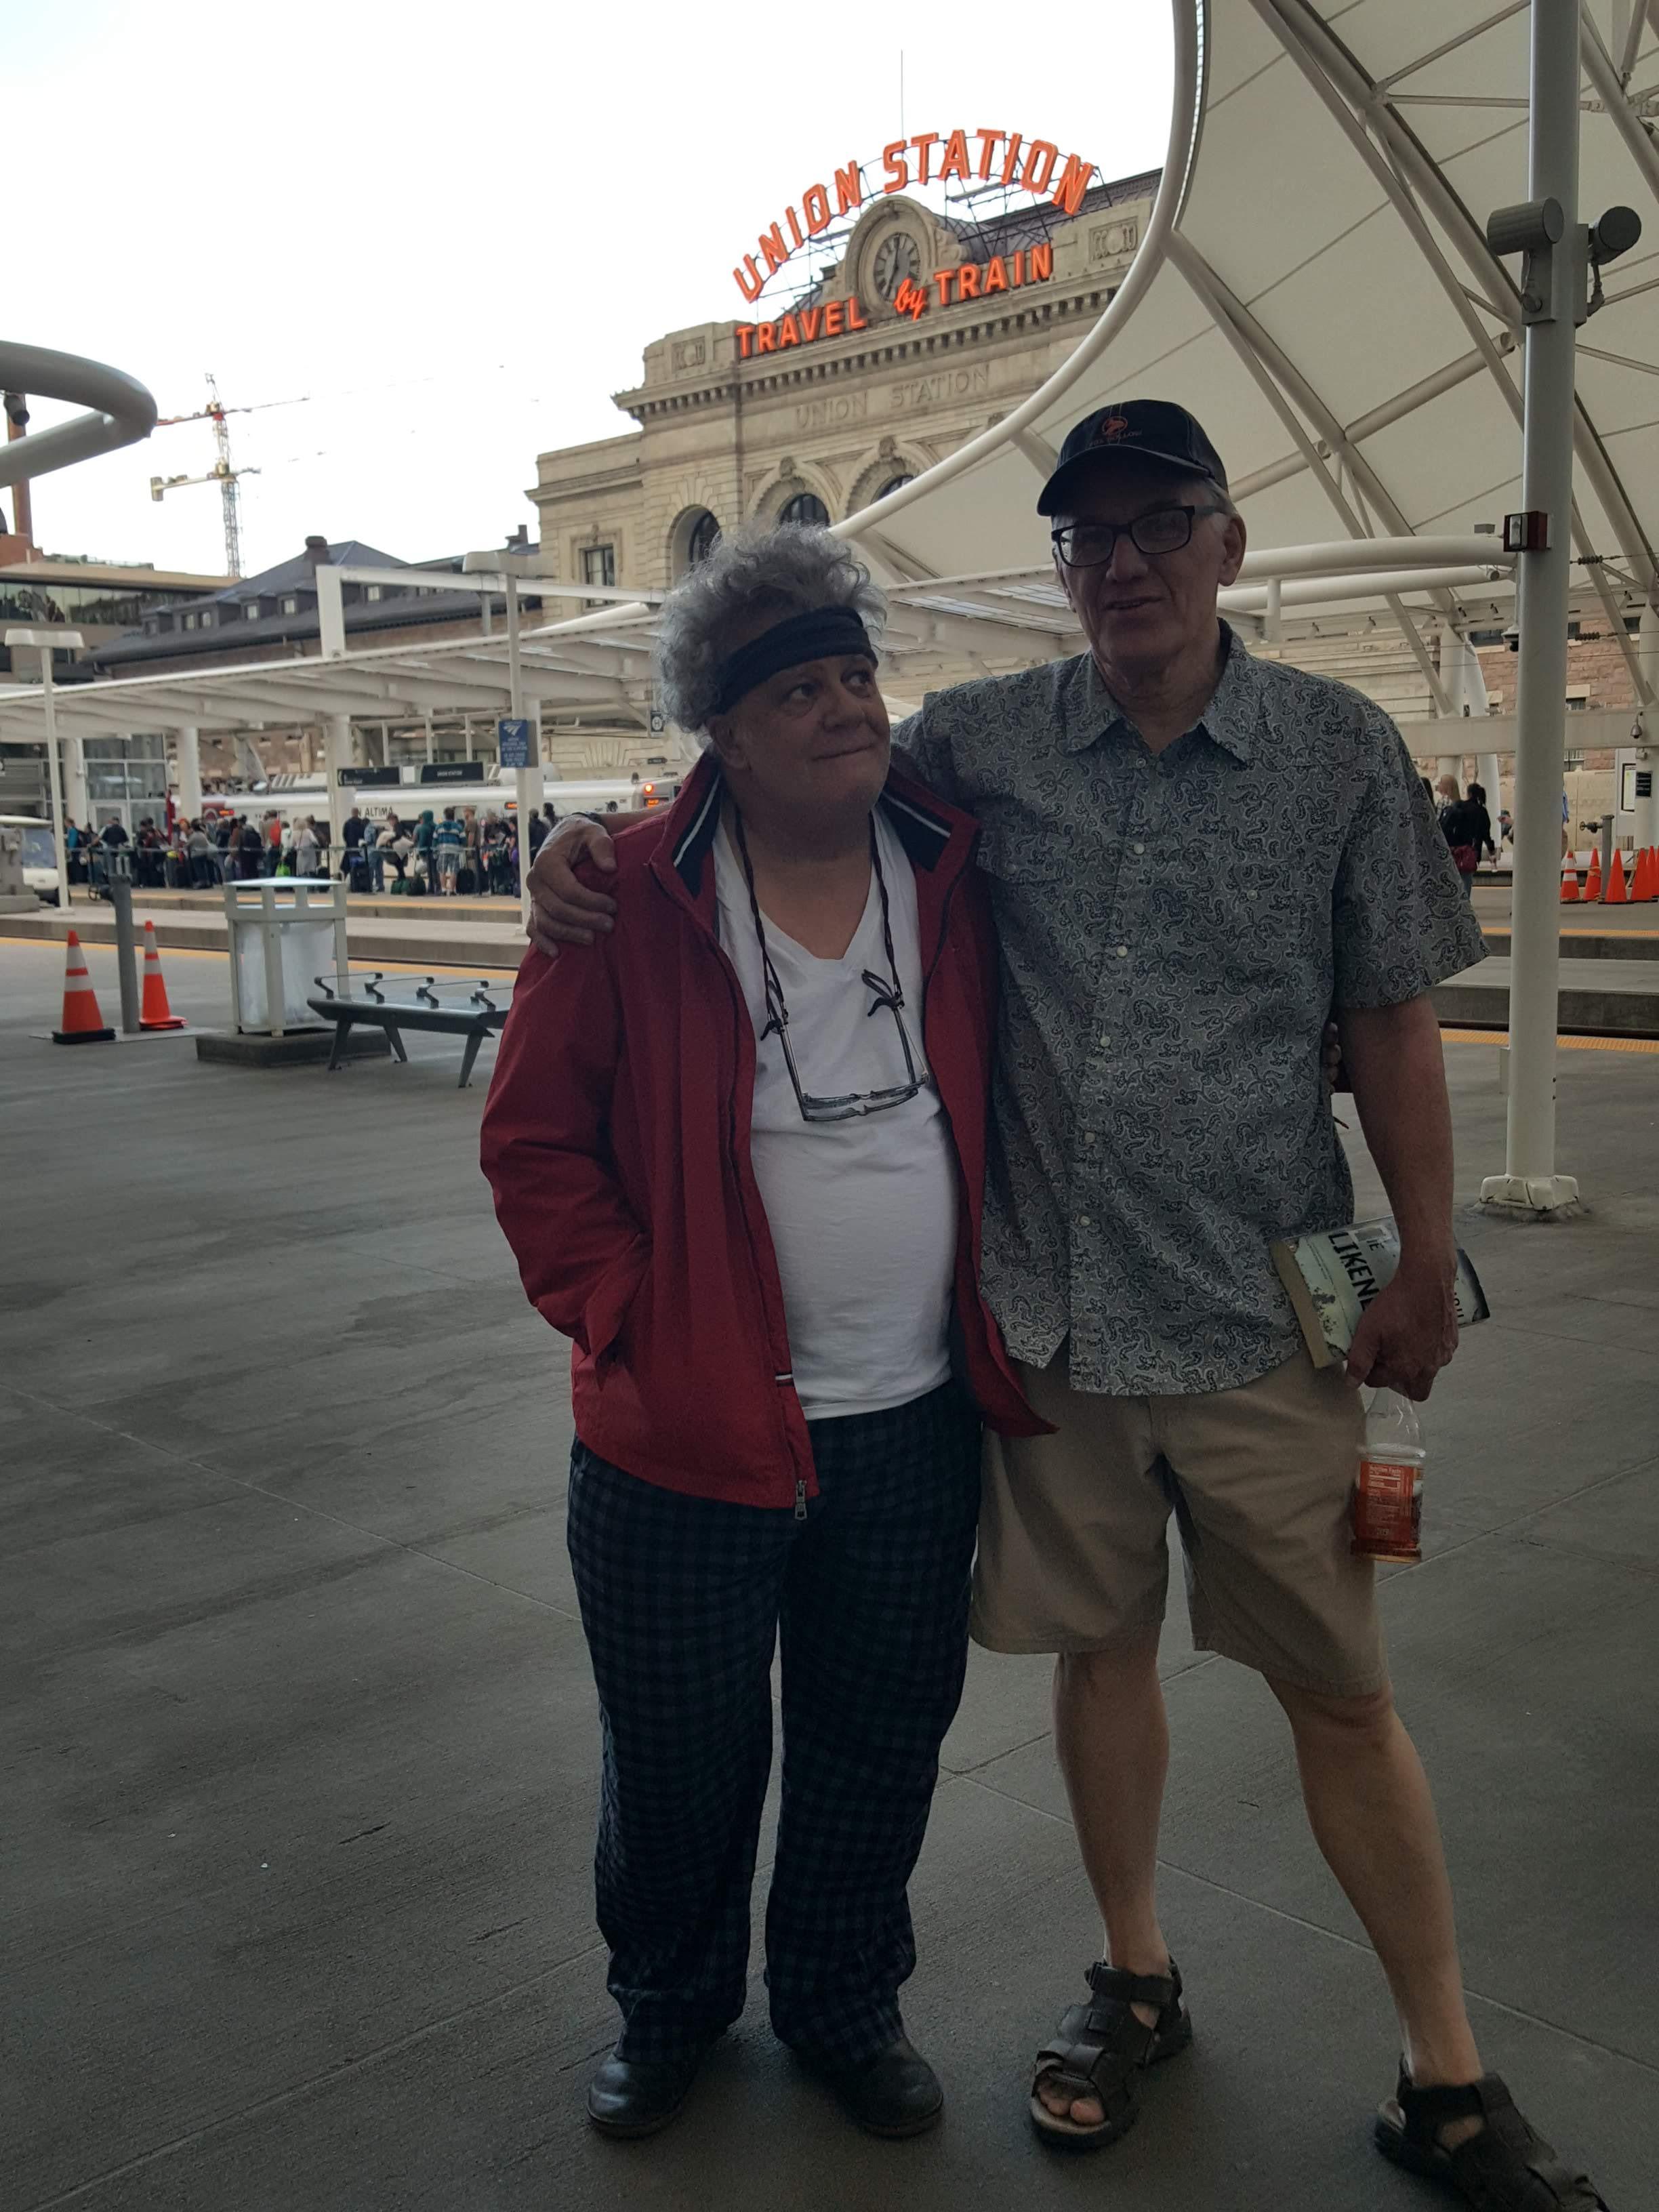 Amtrak Mooning Pictures traveling cross-country via amtrak | plain jane plain talk